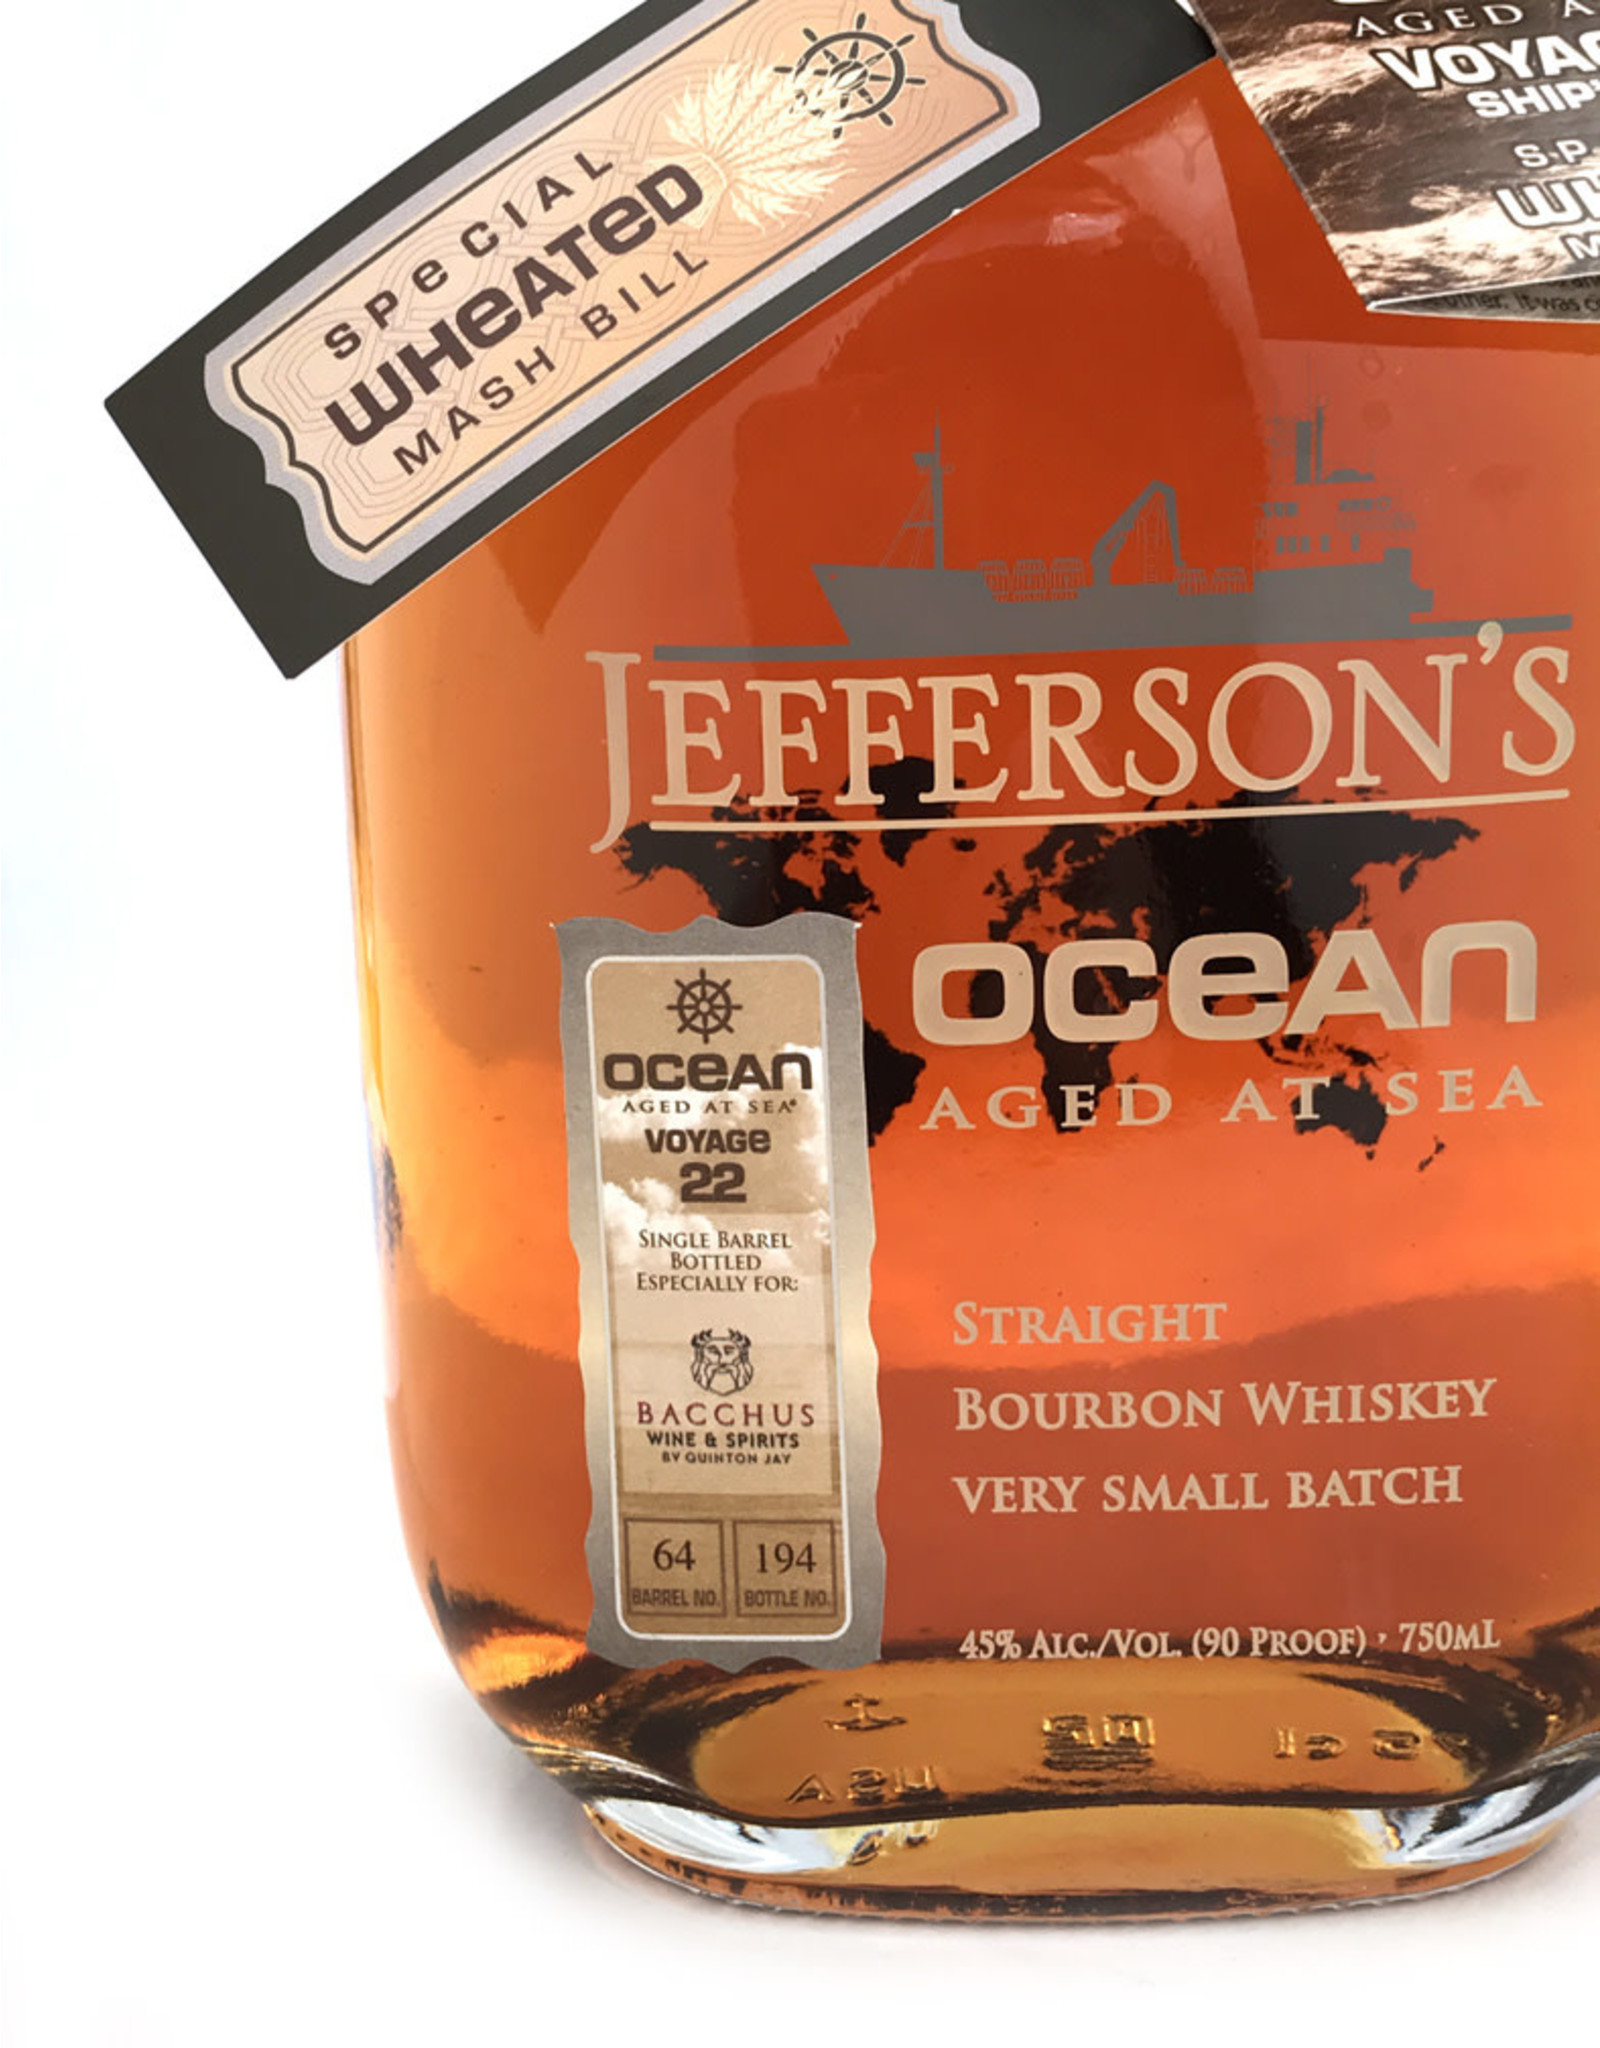 Jefferson's Ocean Voyage #22 Bacchus Barrel #01